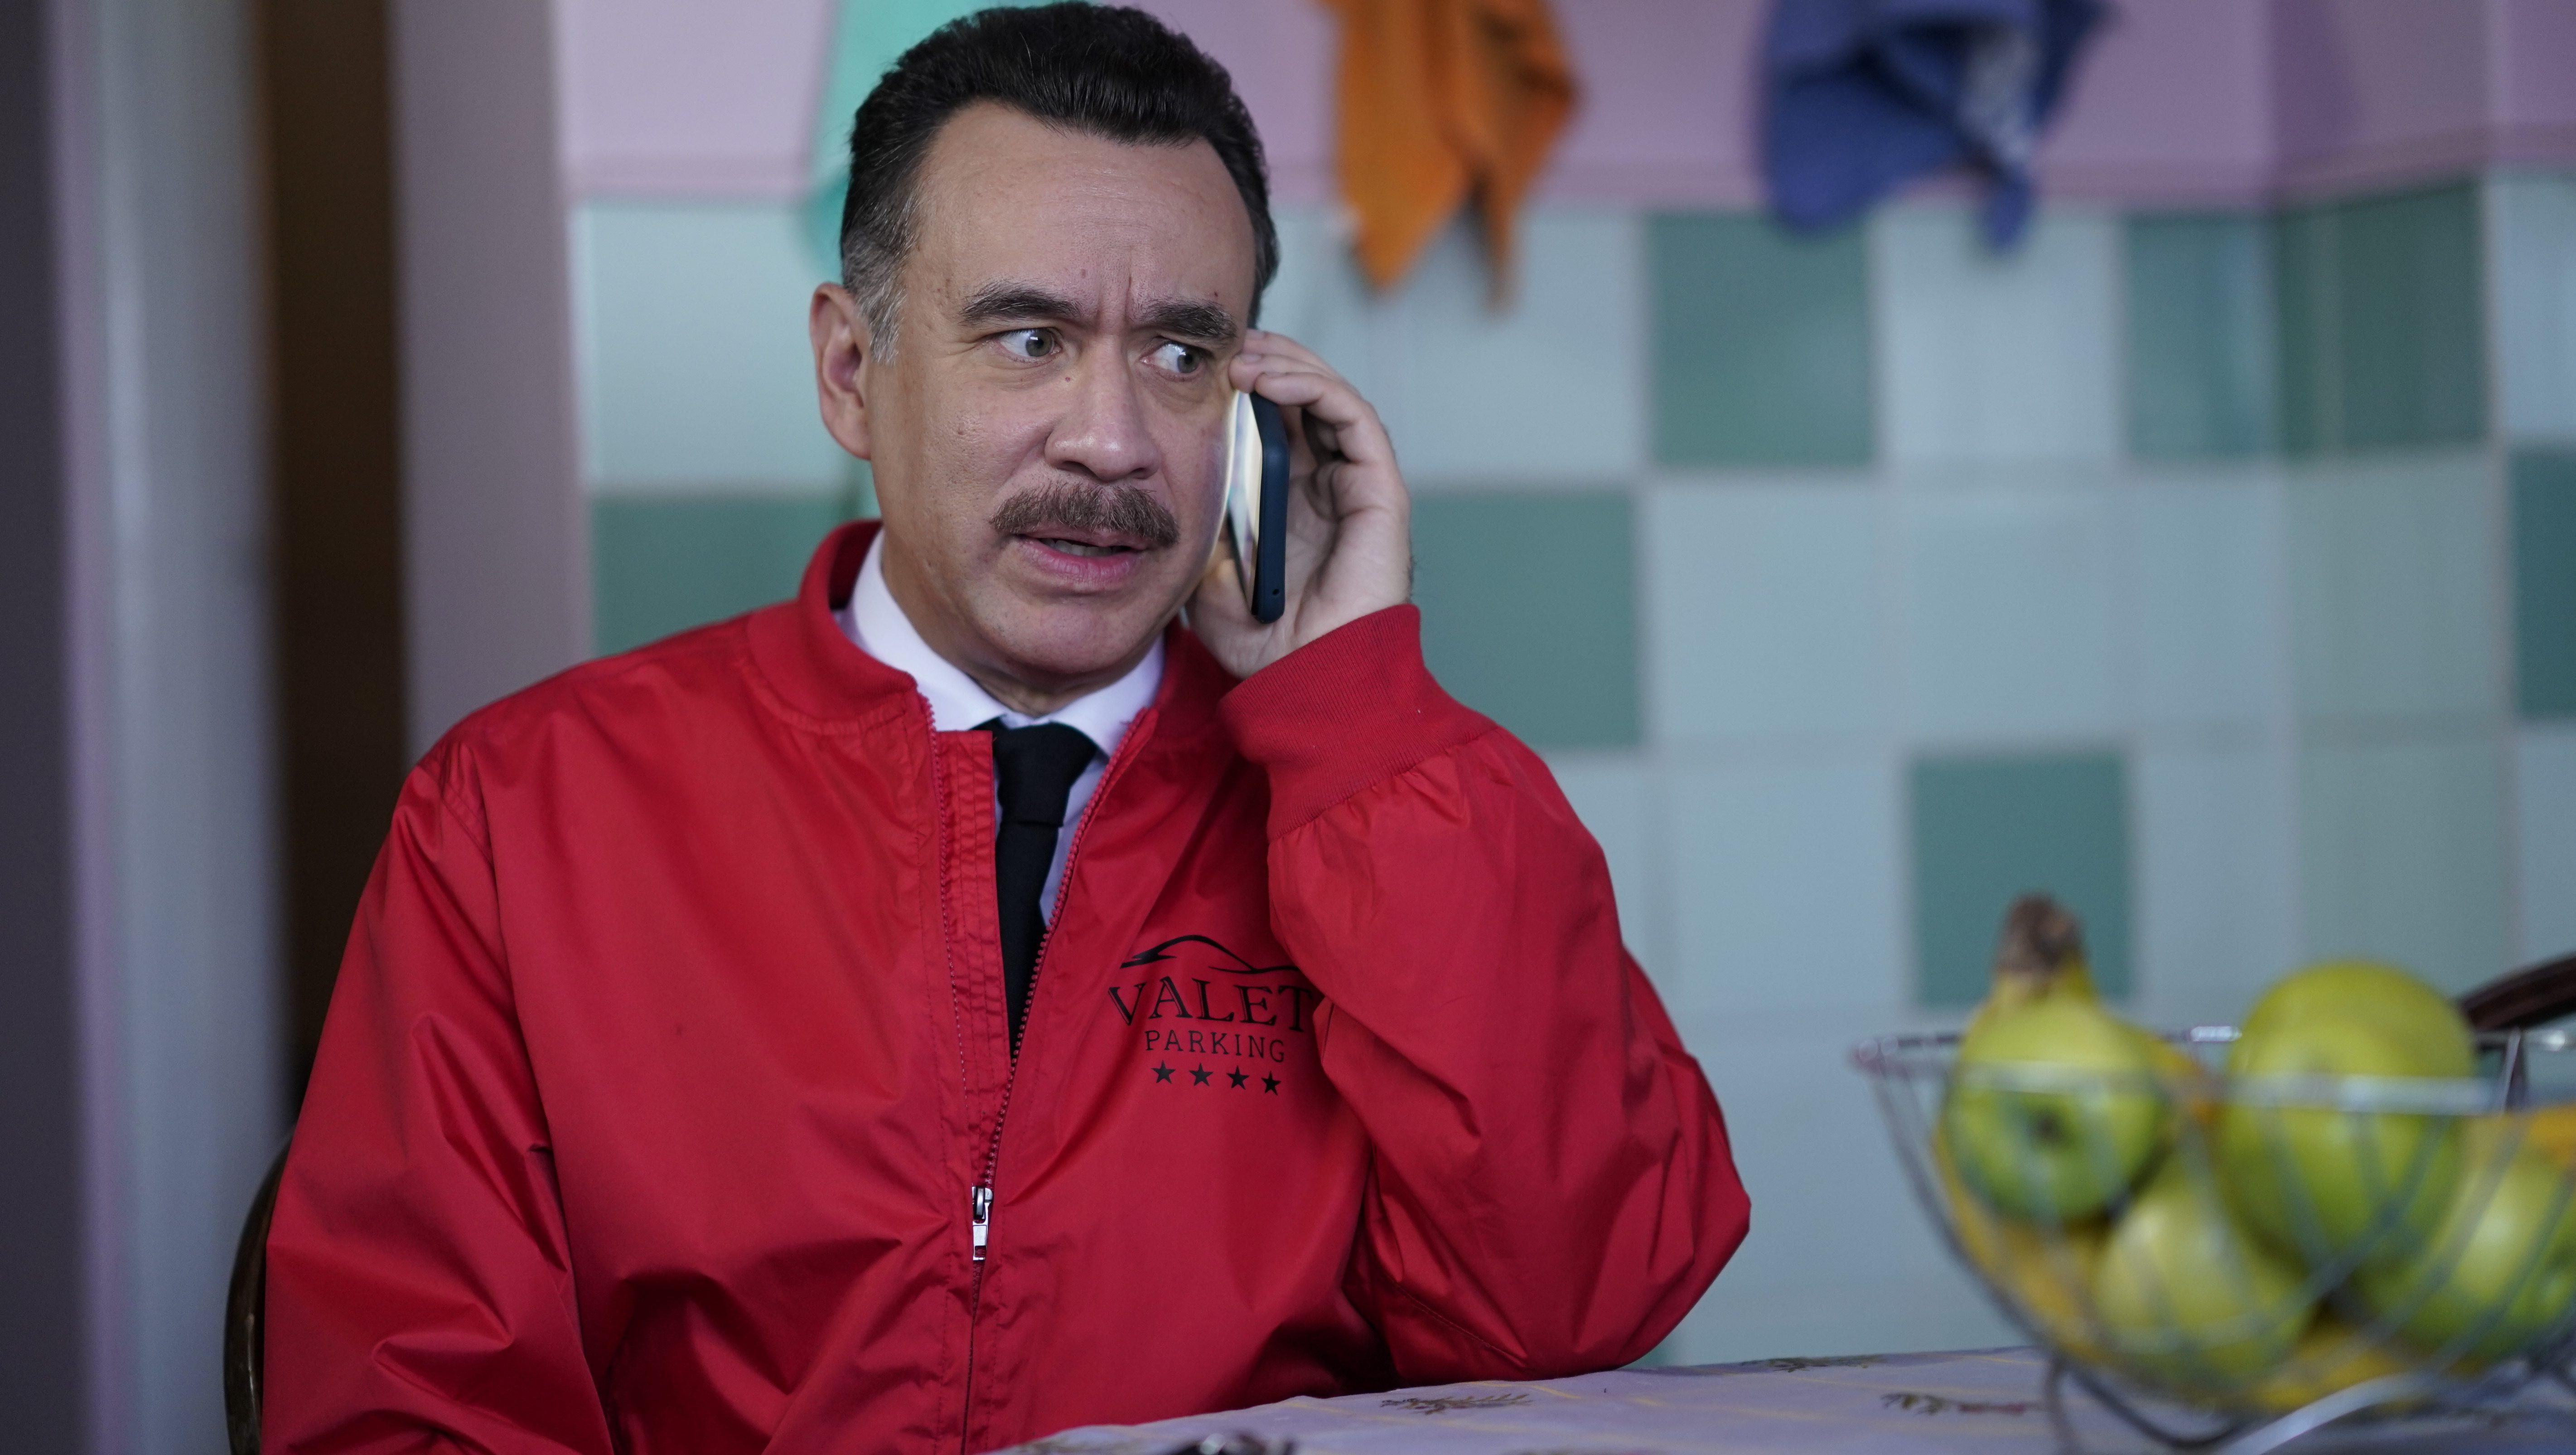 Summer TV series 2019: Los Espookys, Euphoria, The Loudest